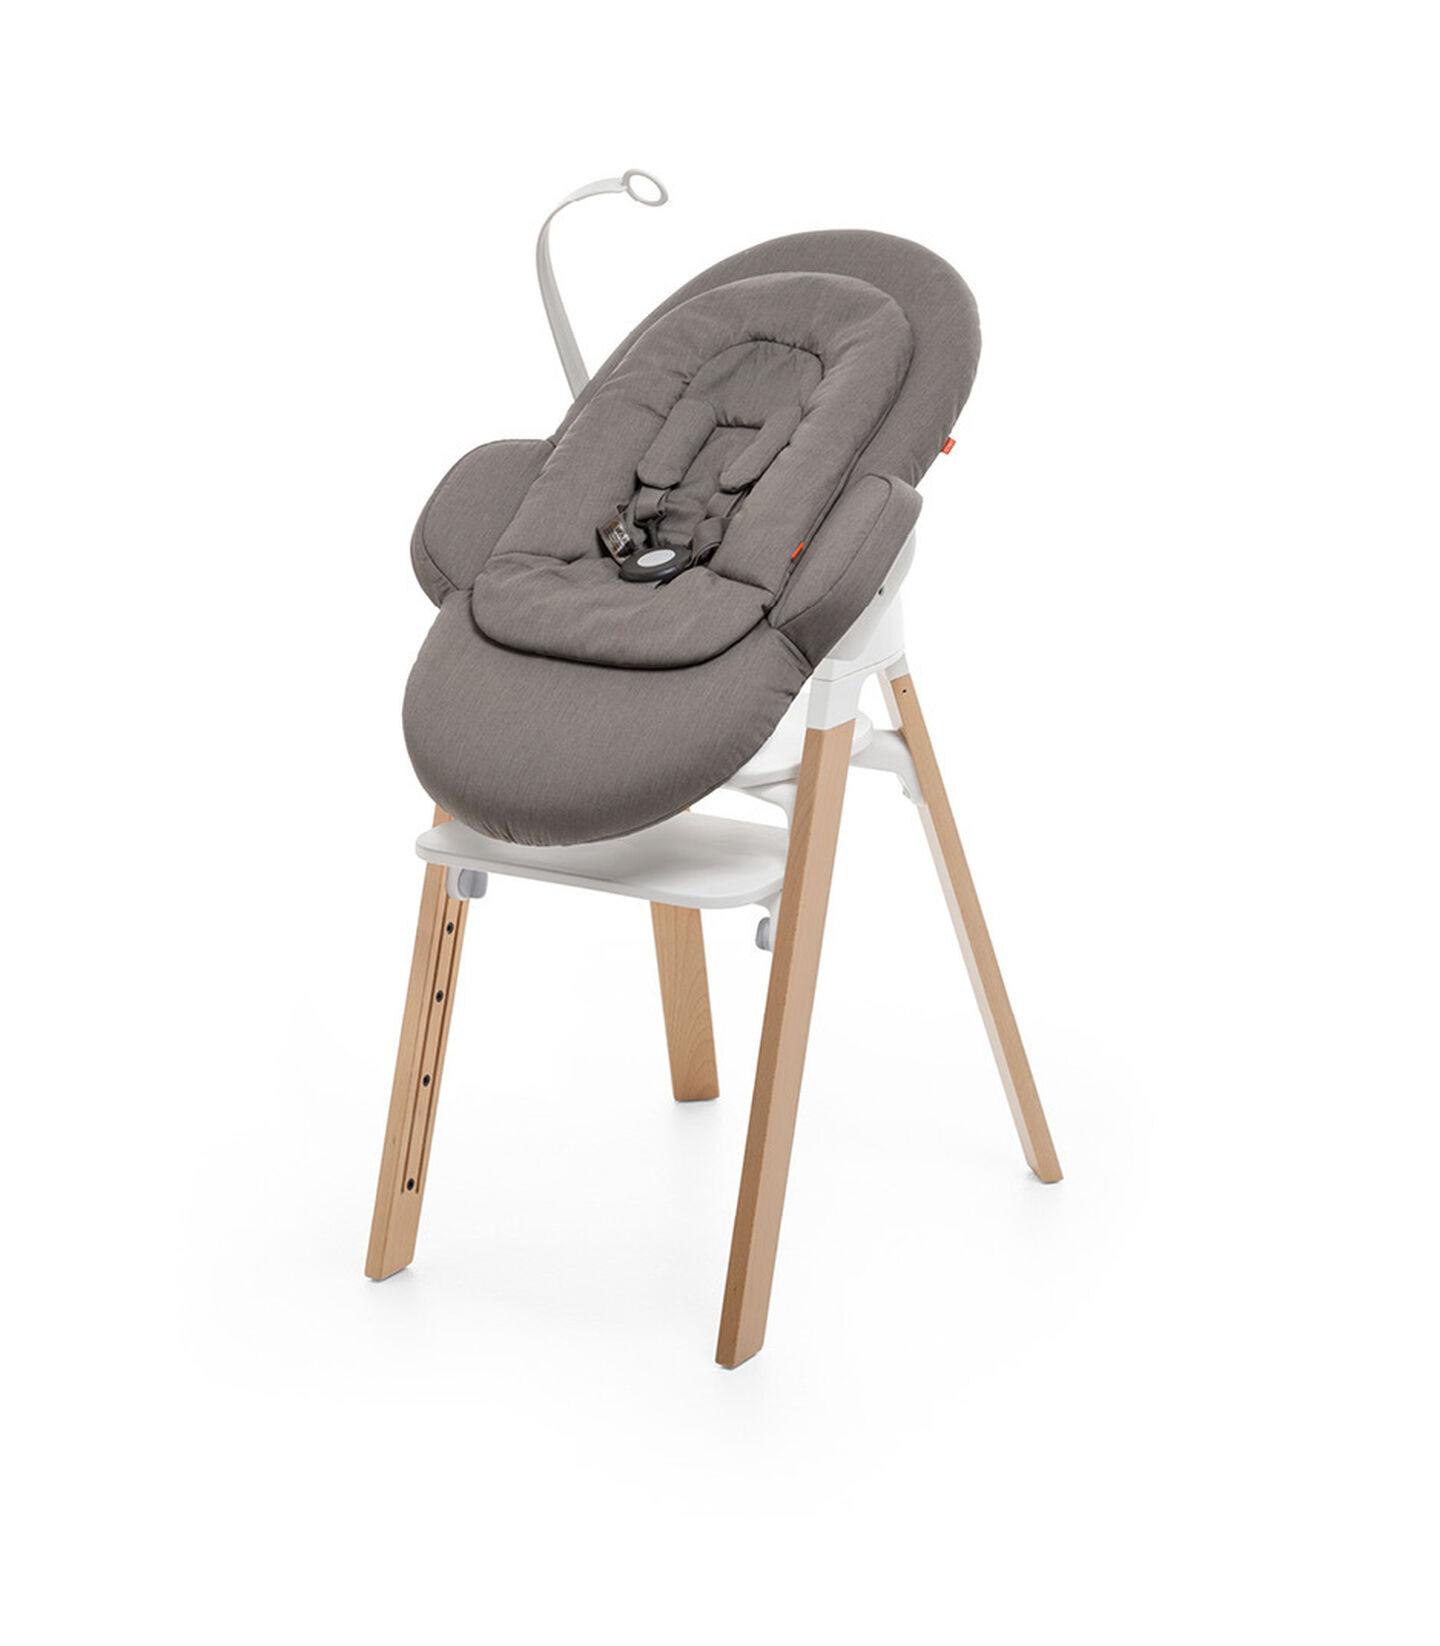 "Stokke® Steps"" Chair, Beech Natural, with Stokke® Steps™ Newborn Set, Greige."